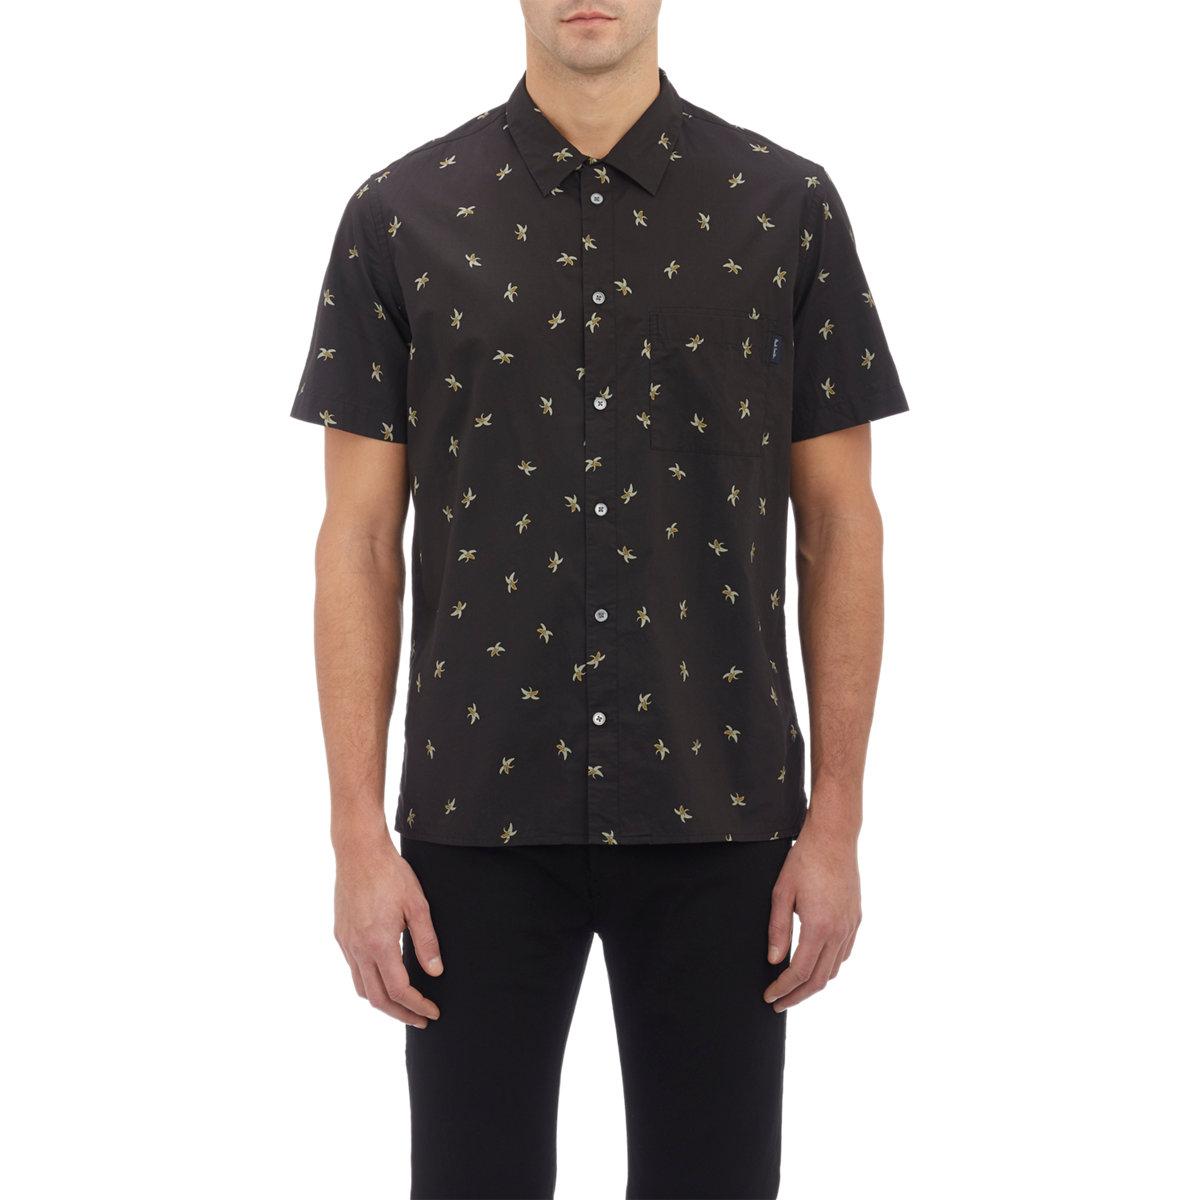 Paul Smith Banana Print Short Sleeve Shirt In Black For